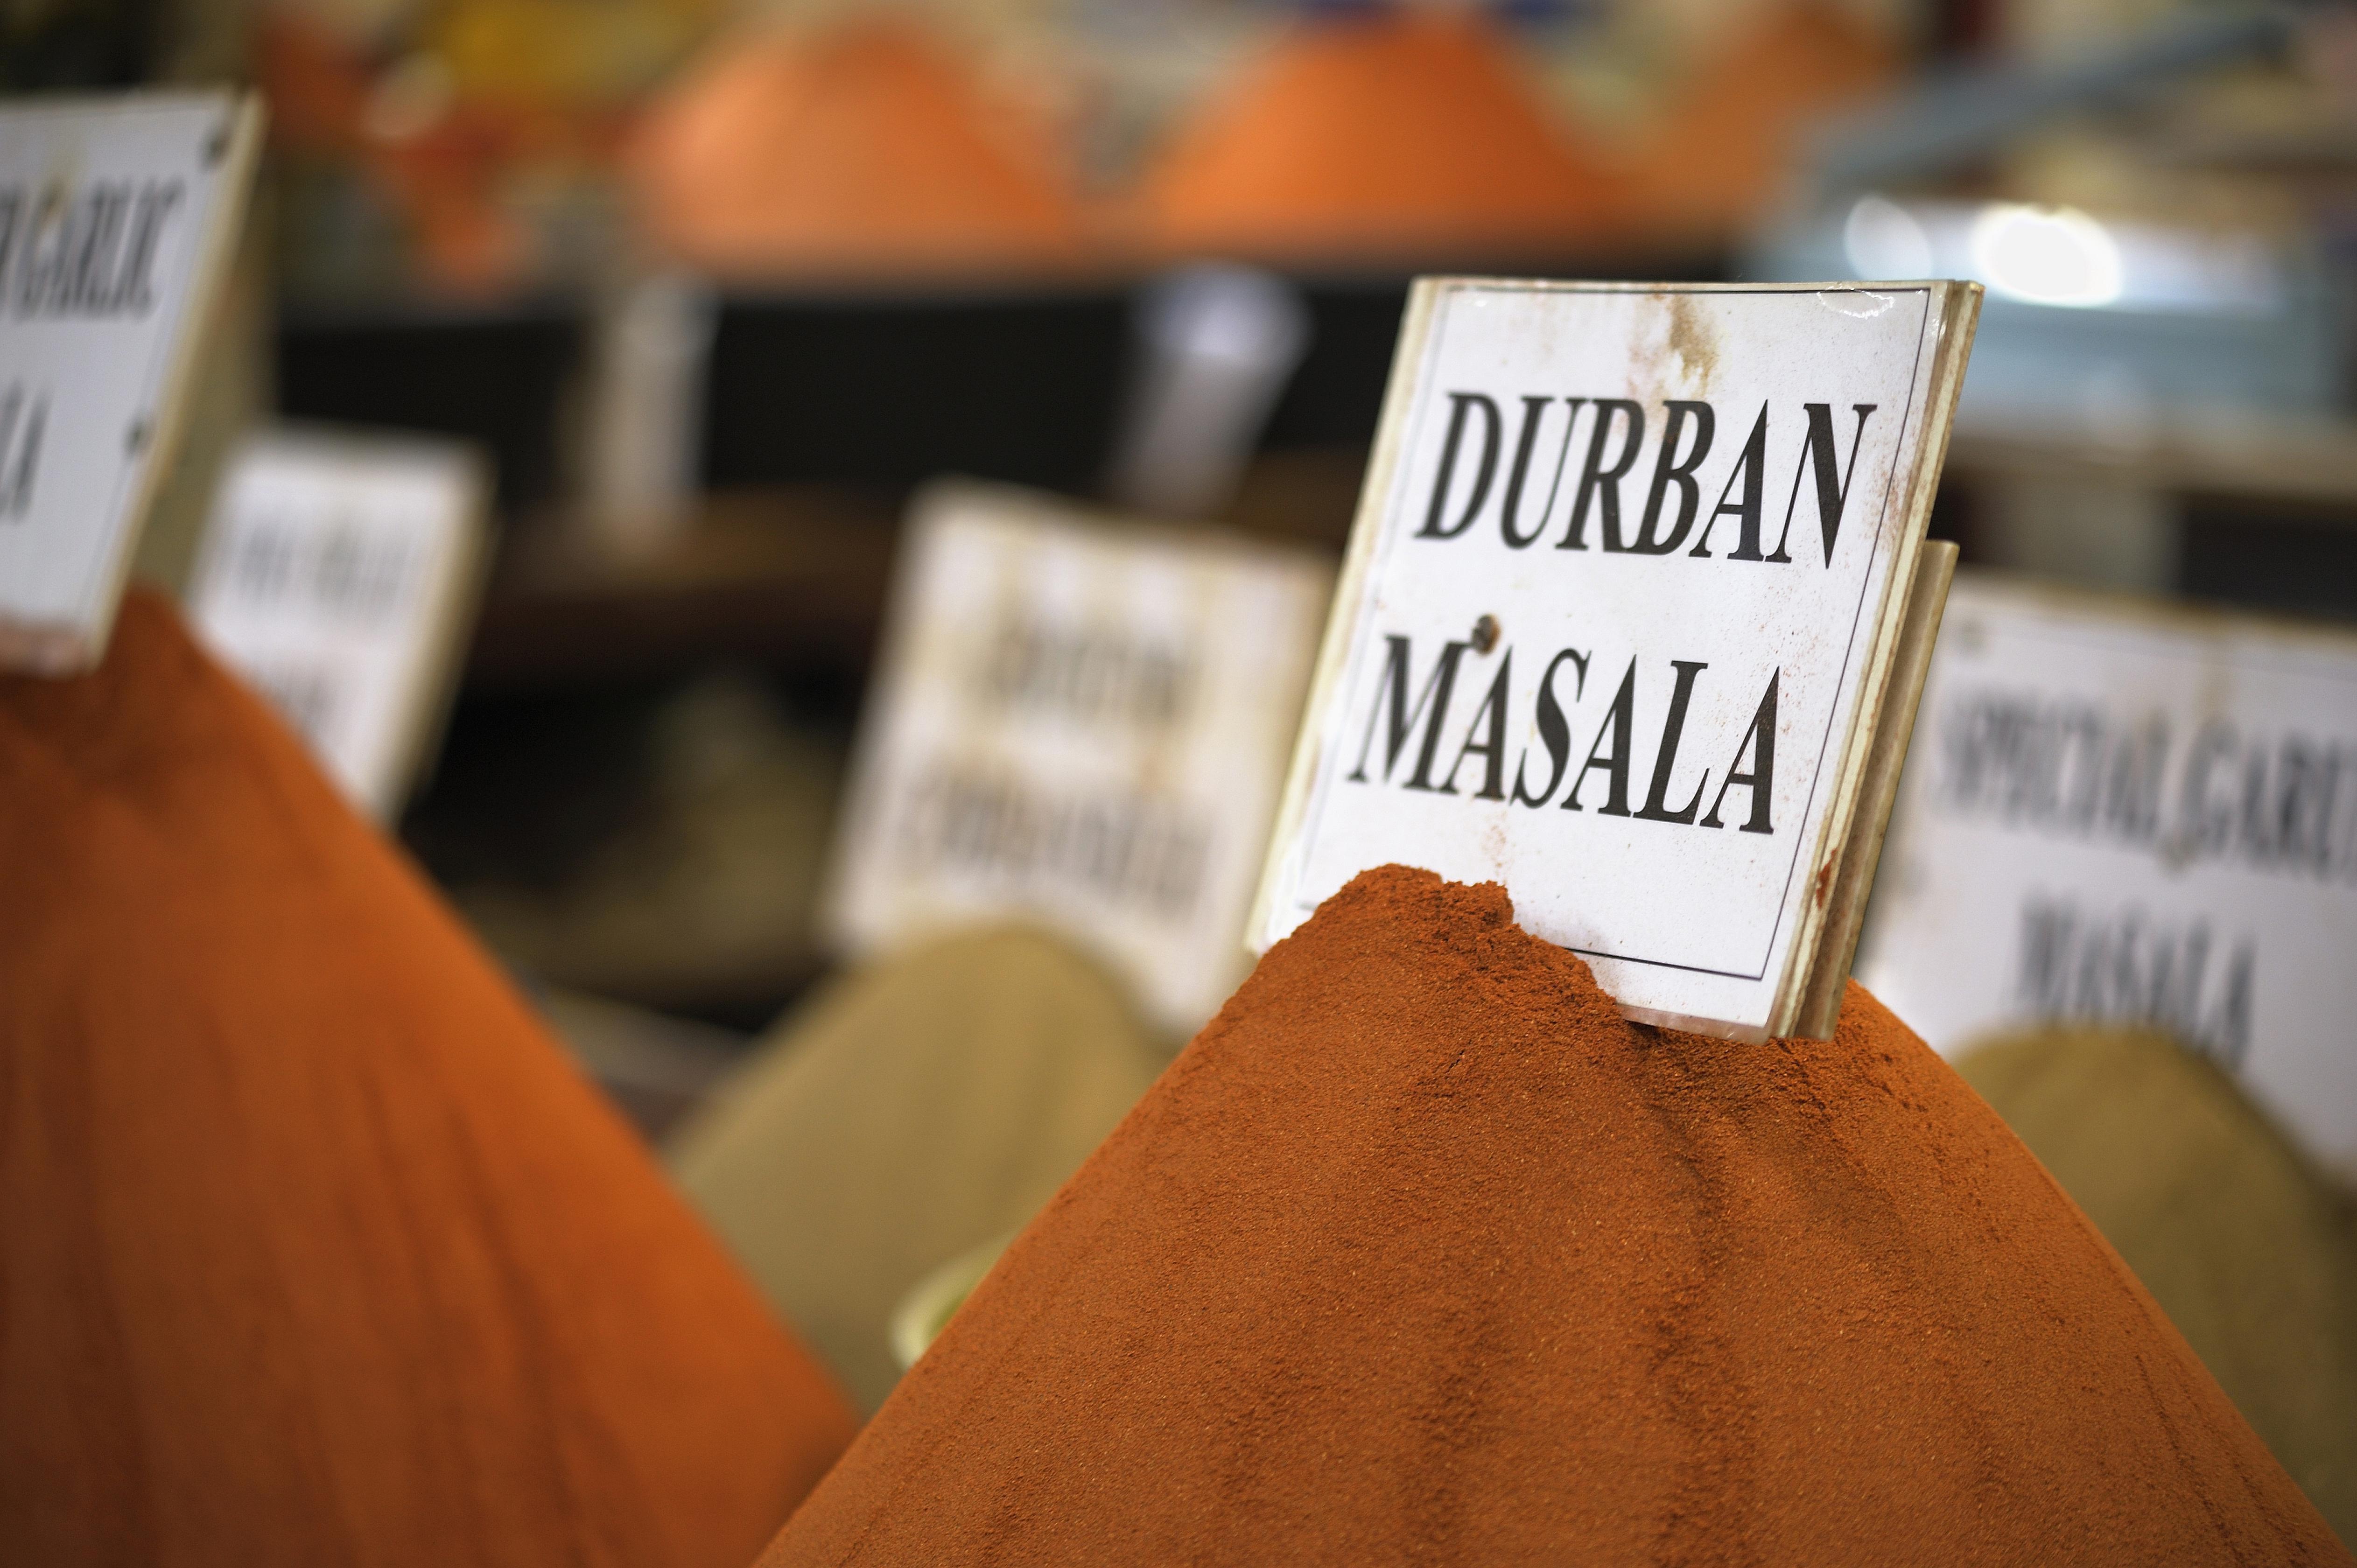 Durban Curry Masala Spice Blend